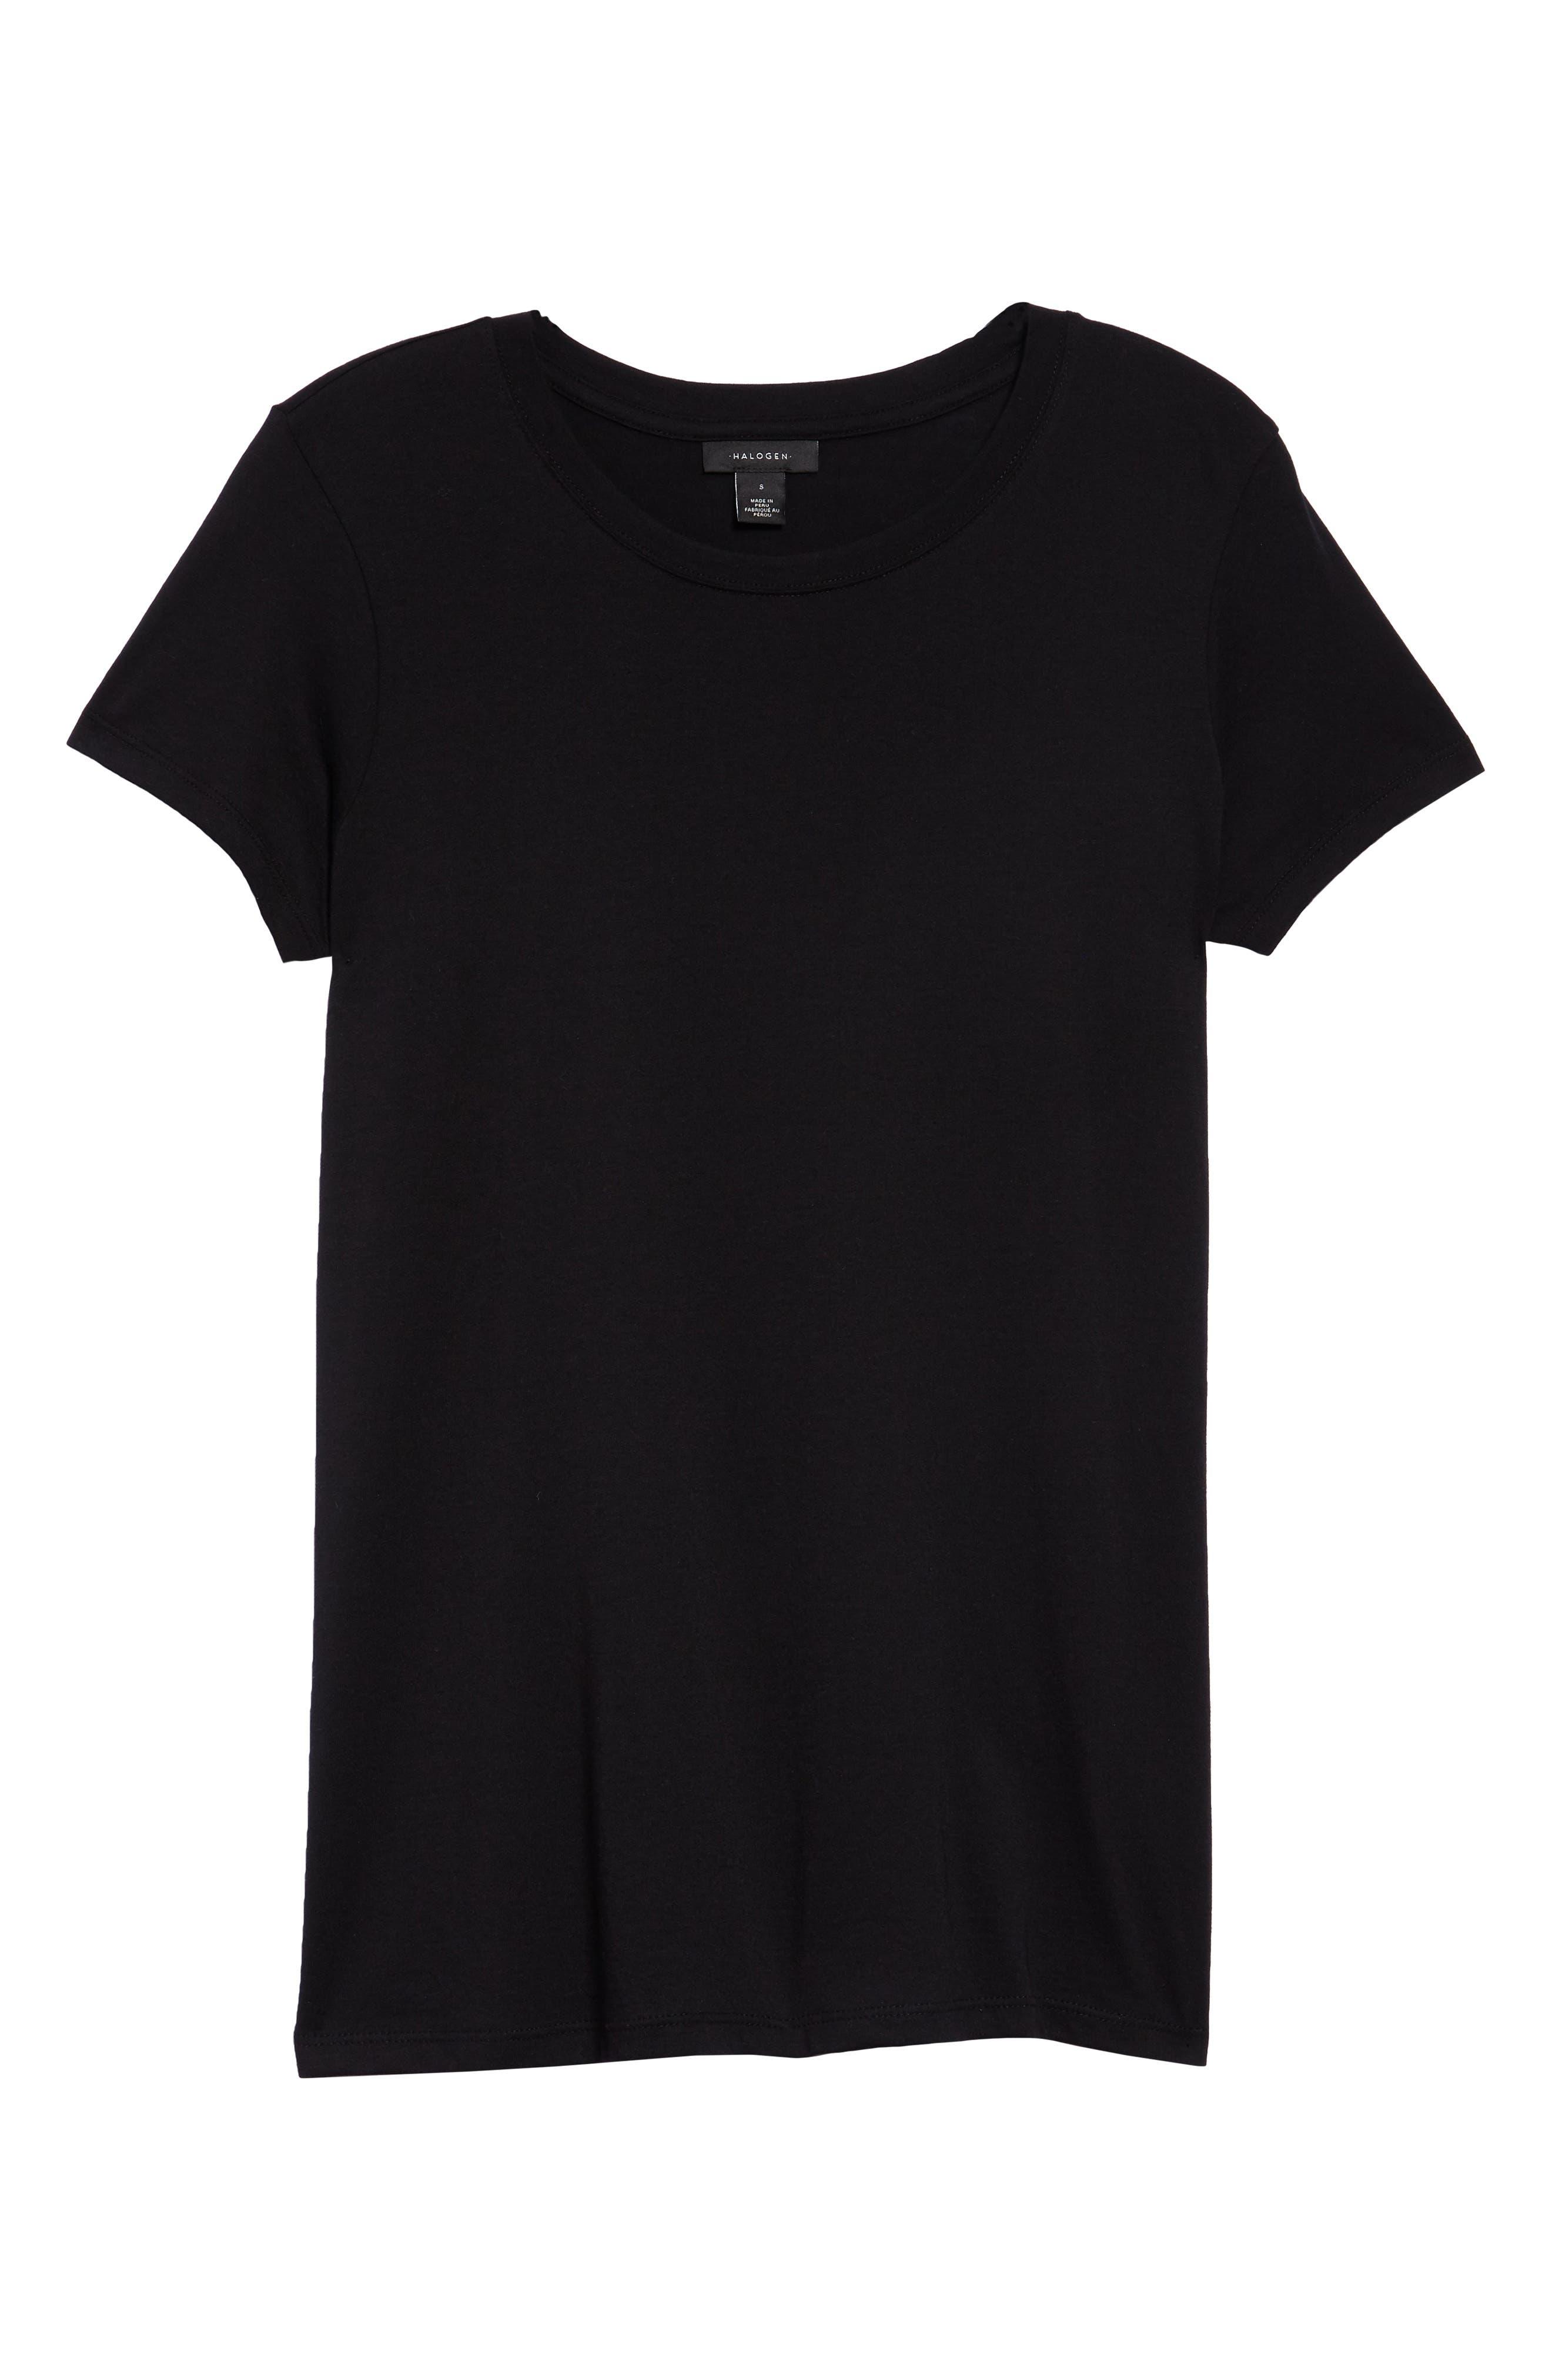 Short Sleeve Crewneck Tee, Main, color, BLACK